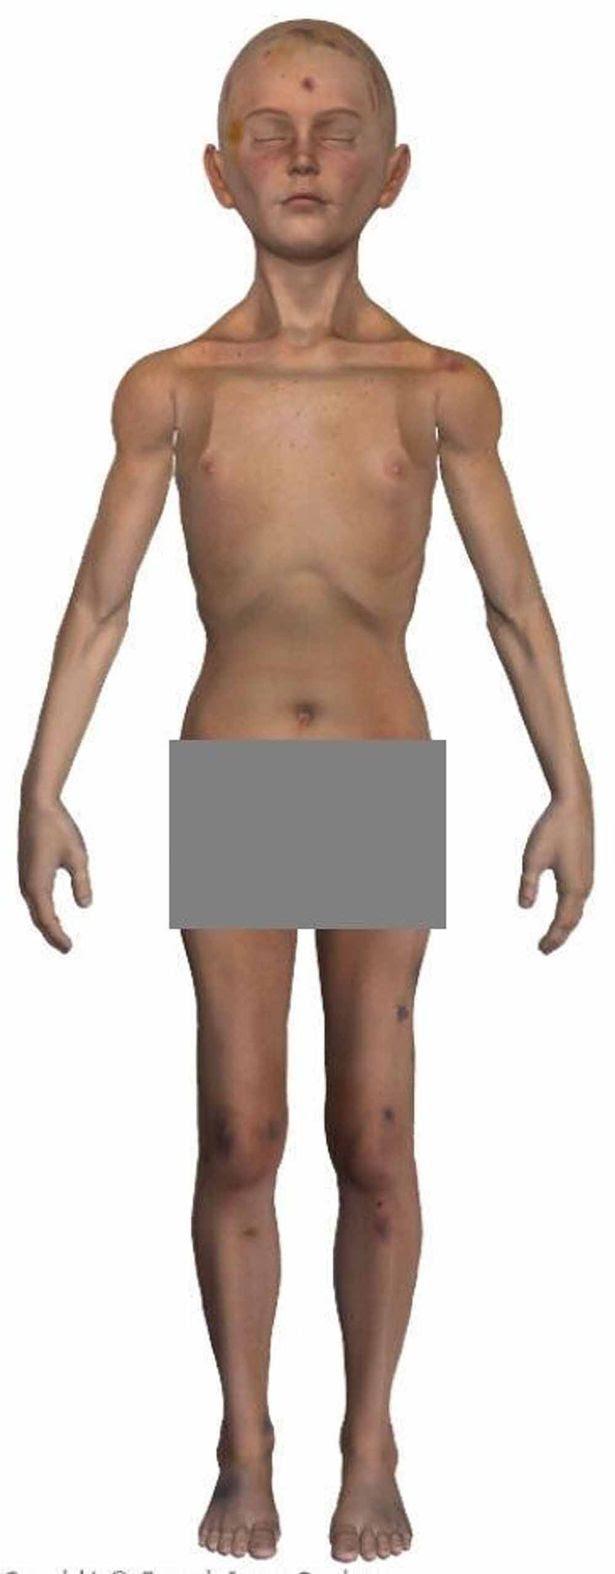 Daniel Pelka 2D front image of bruising